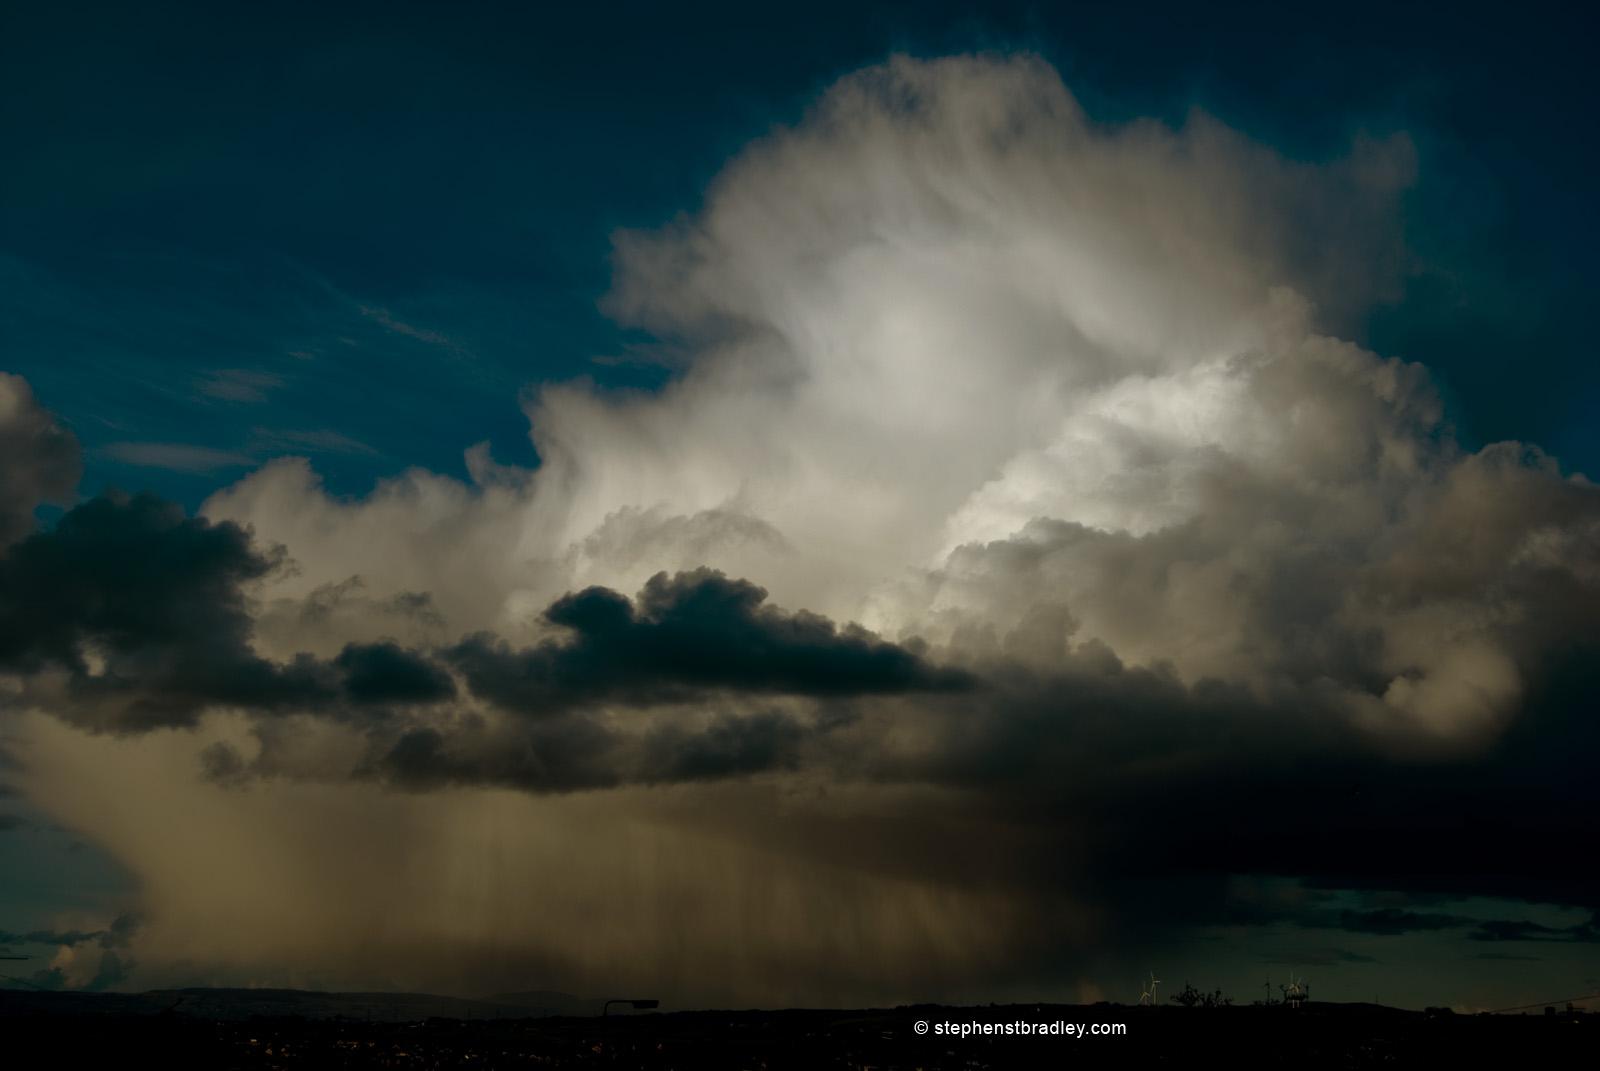 Dramatic sky over Glengormley Northern Ireland- image1023.